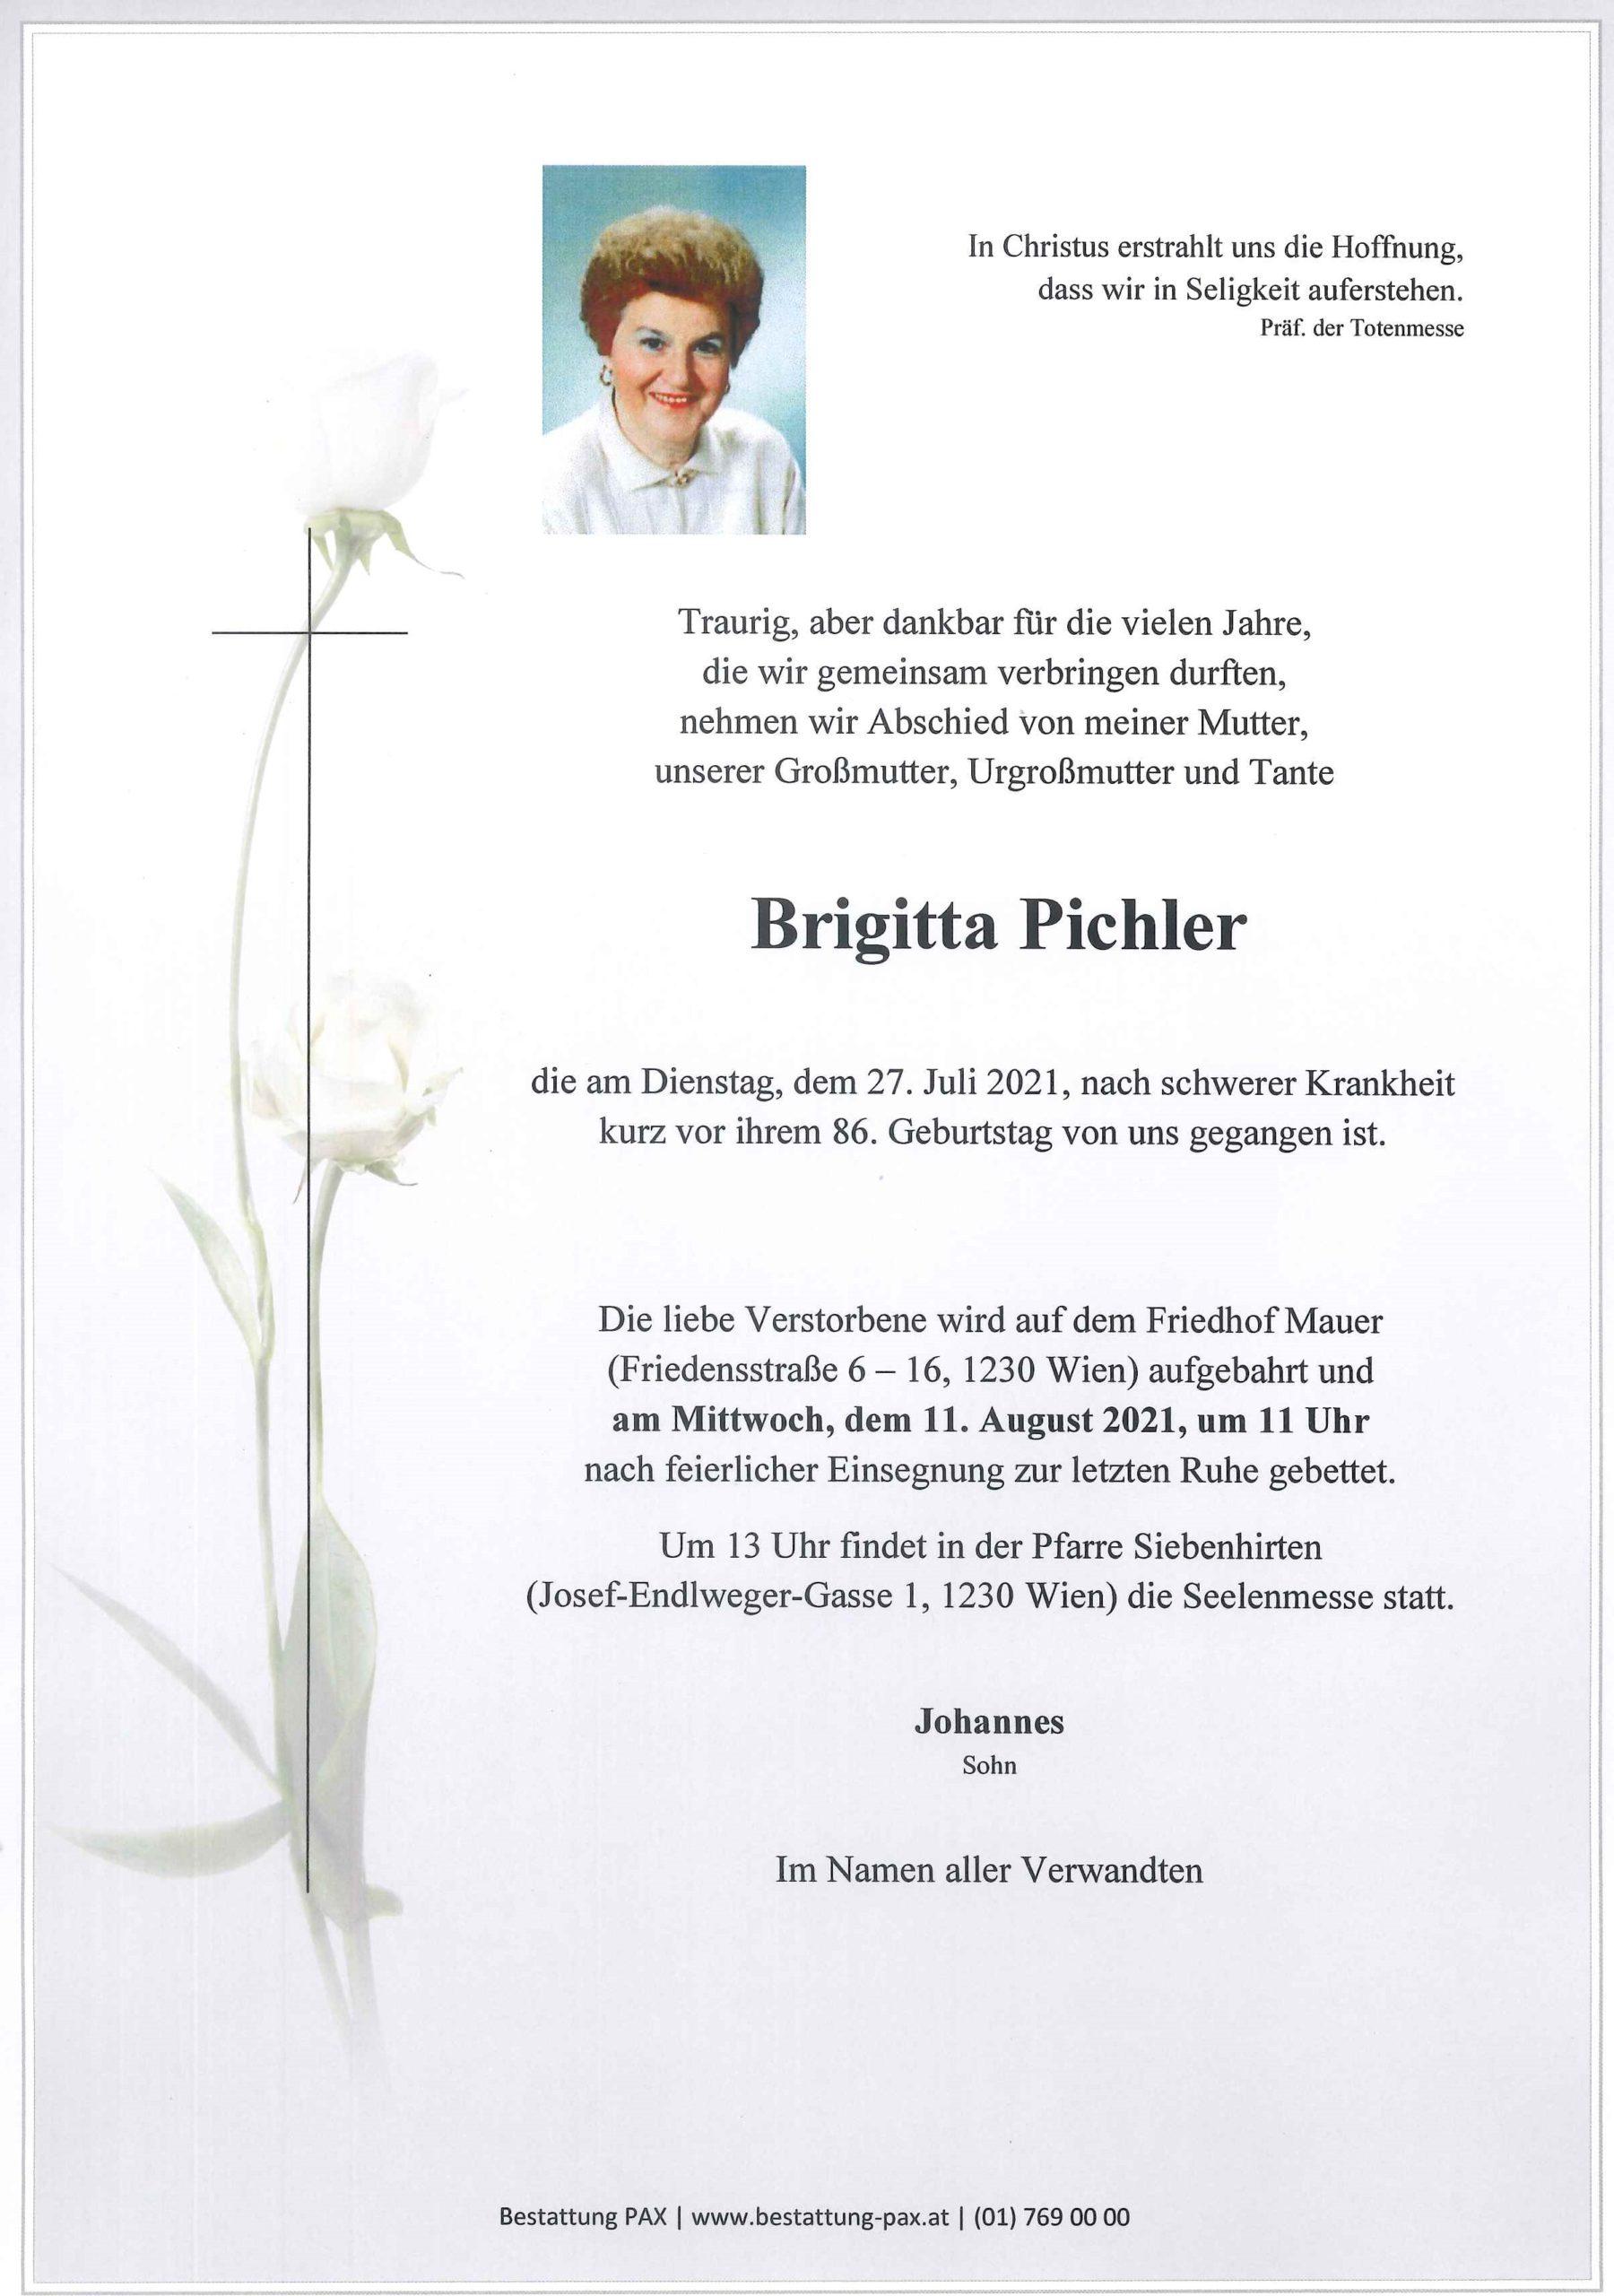 Brigitta Pichler